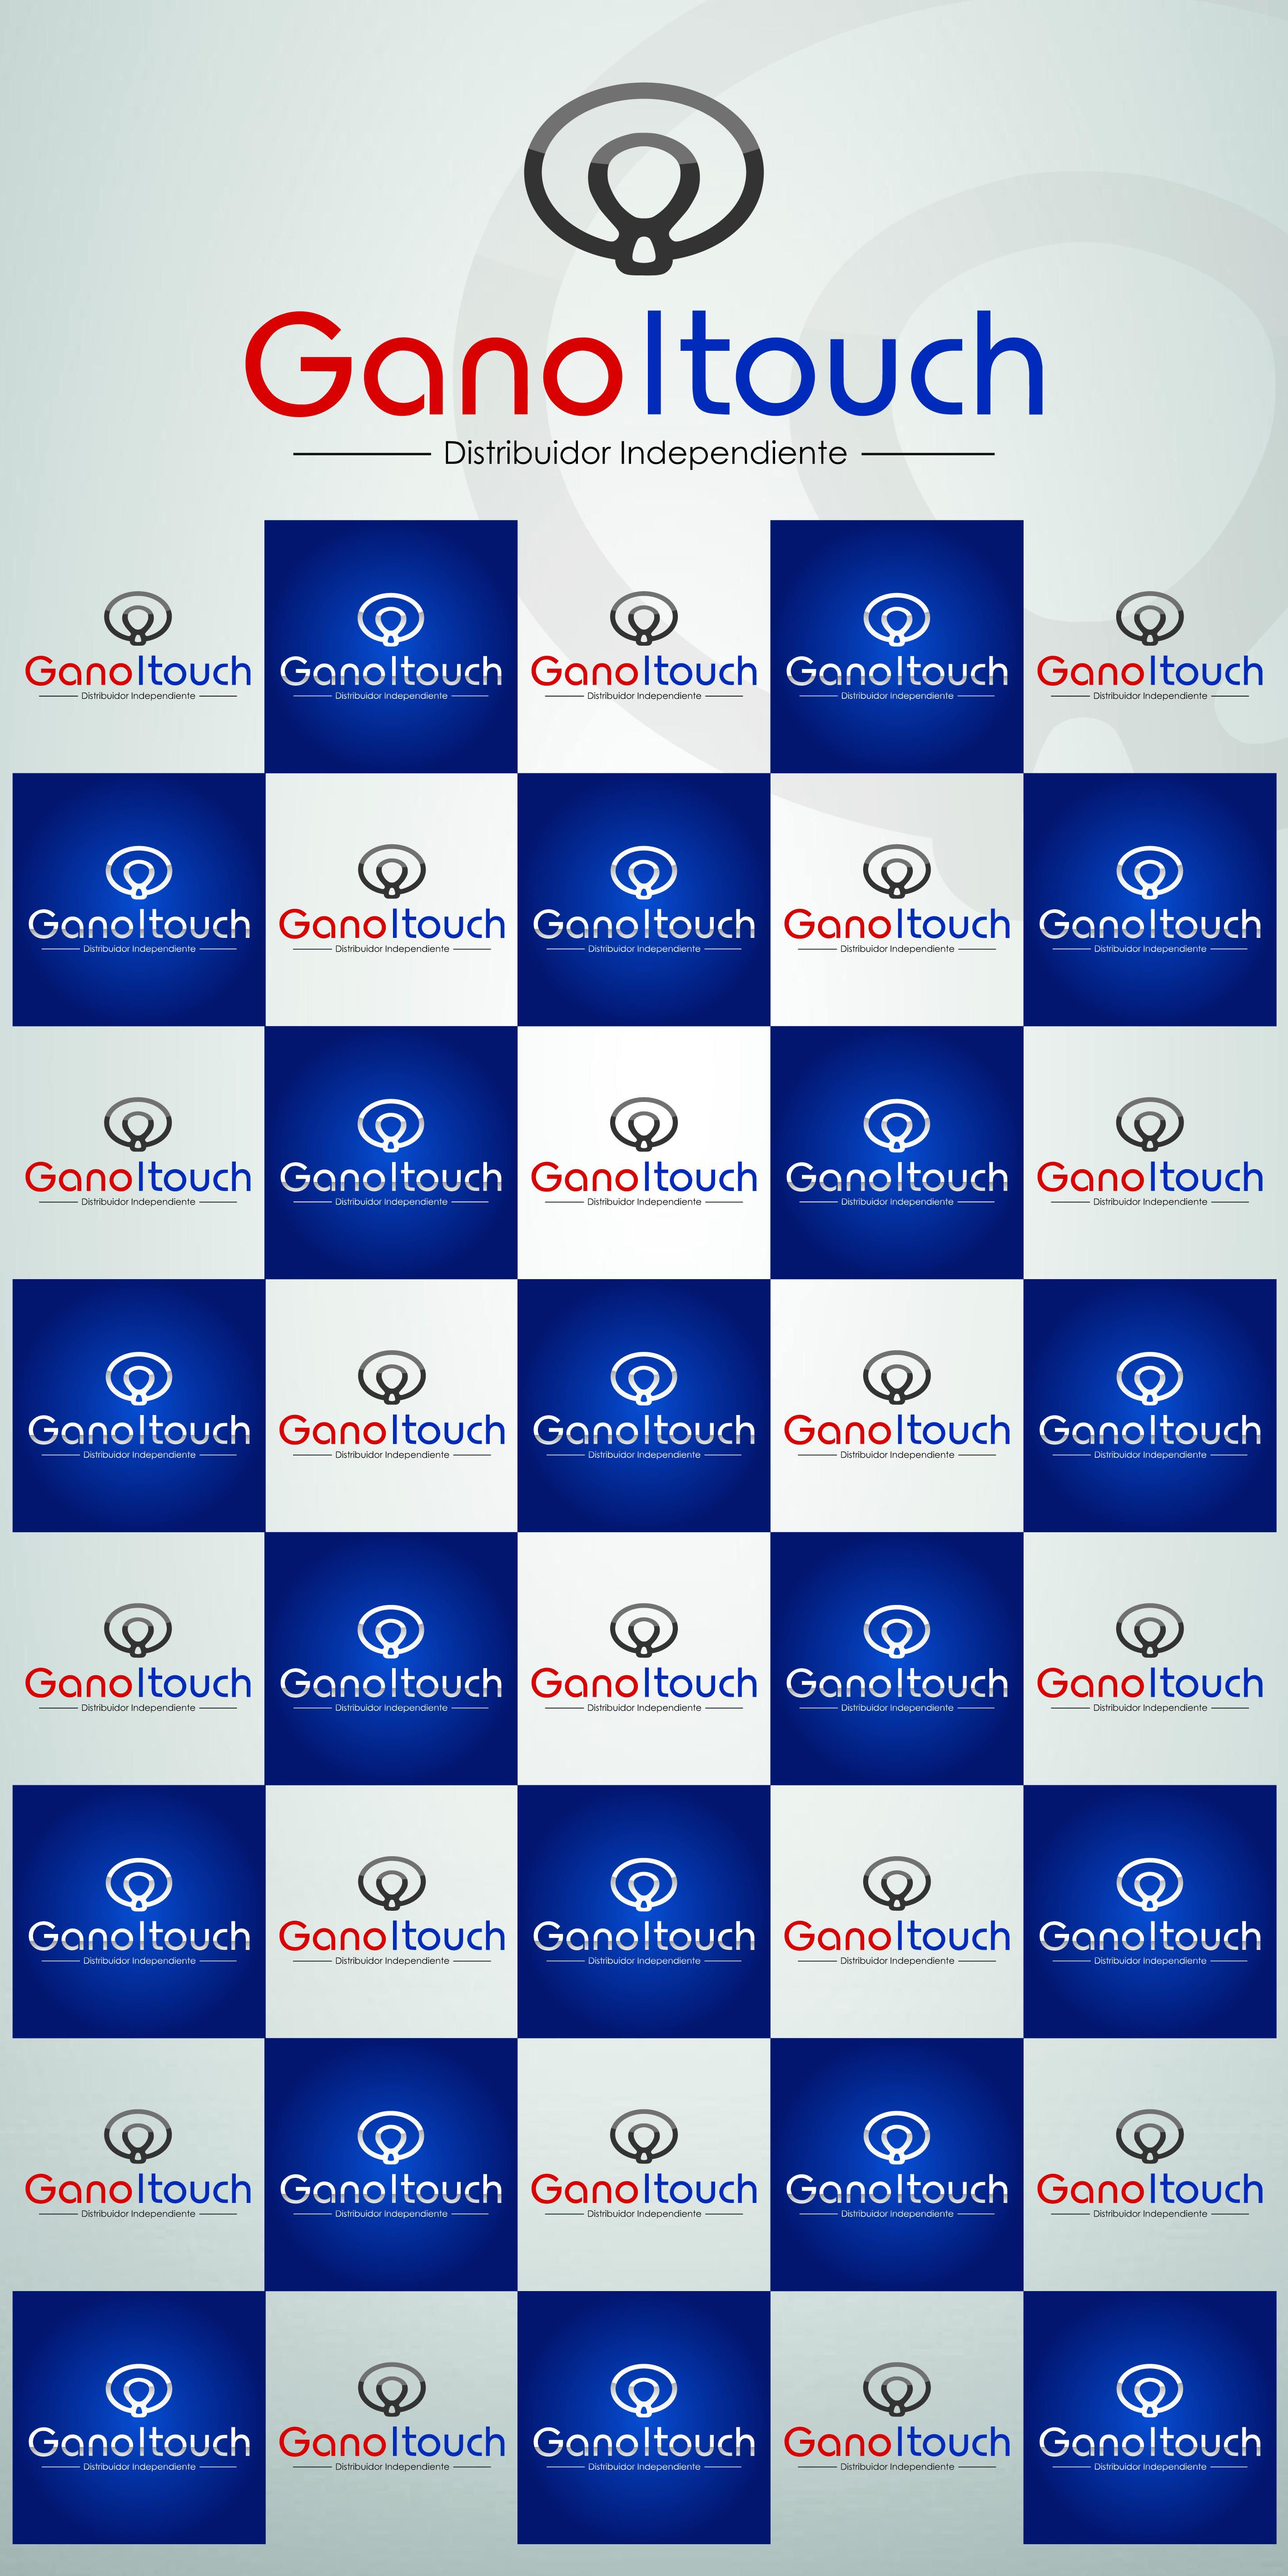 https://www.gano-itouch.com.pe/wp-content/uploads/Logos-azul-1.jpg